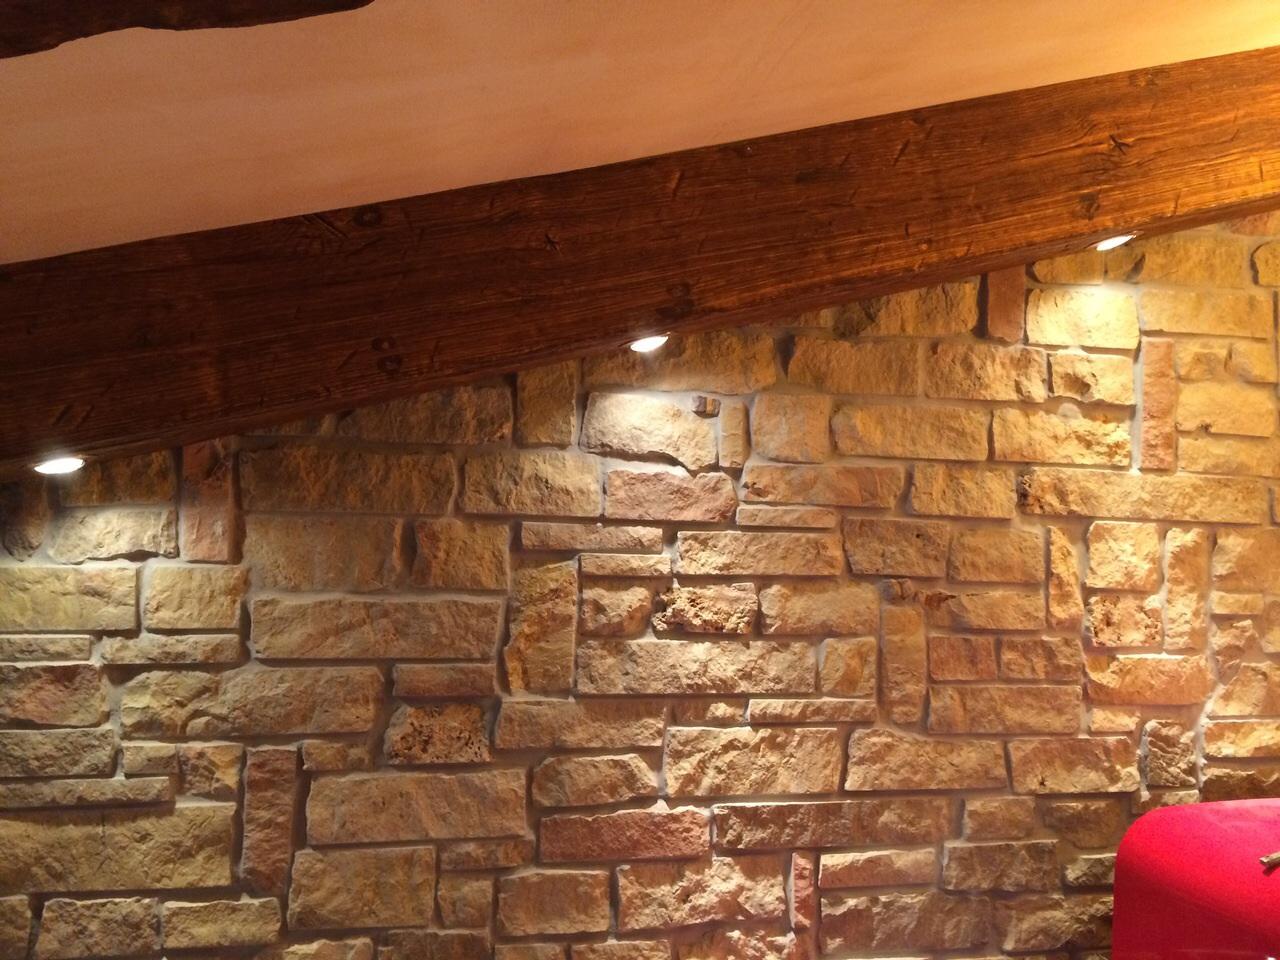 Rivestimento parete interna pietre raffaele cileo - Rivestimento parete interna ...